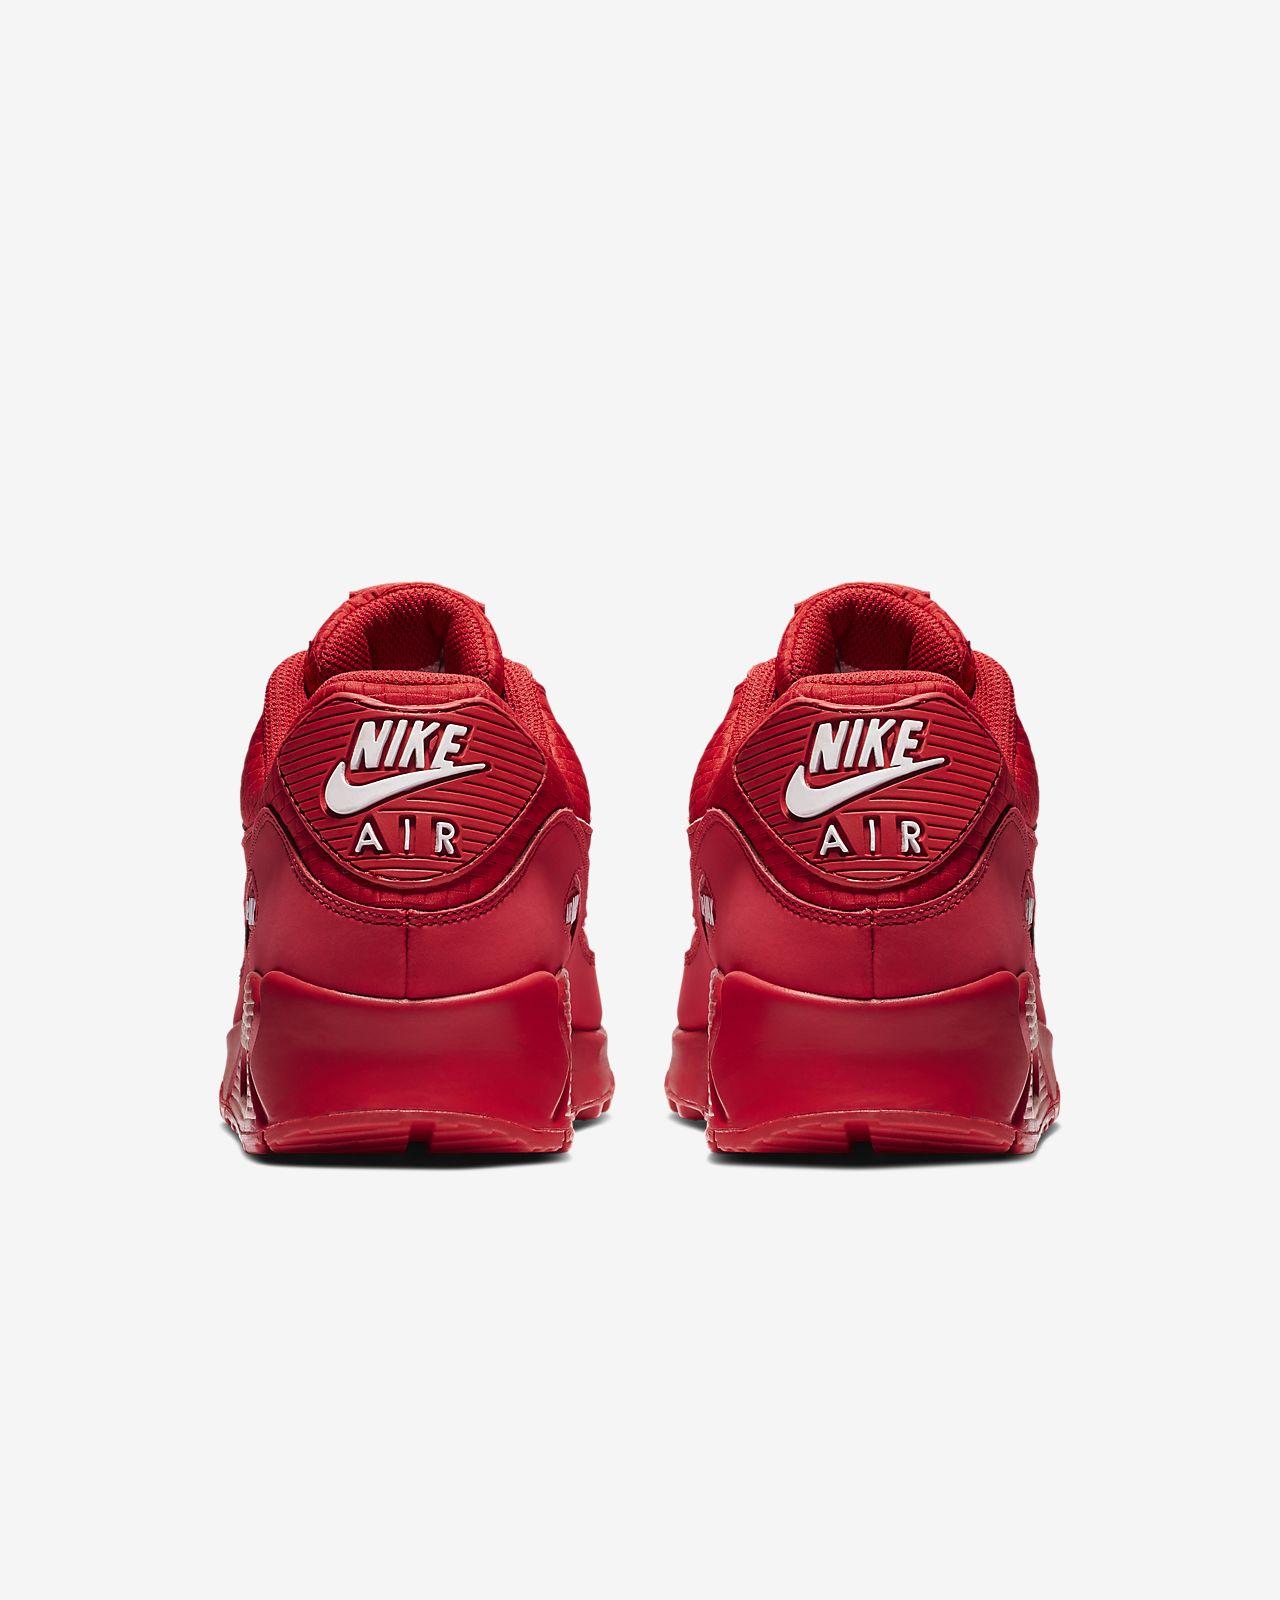 separation shoes f0a4b e9ca3 ... Nike Air Max 90 Essential Men s Shoe